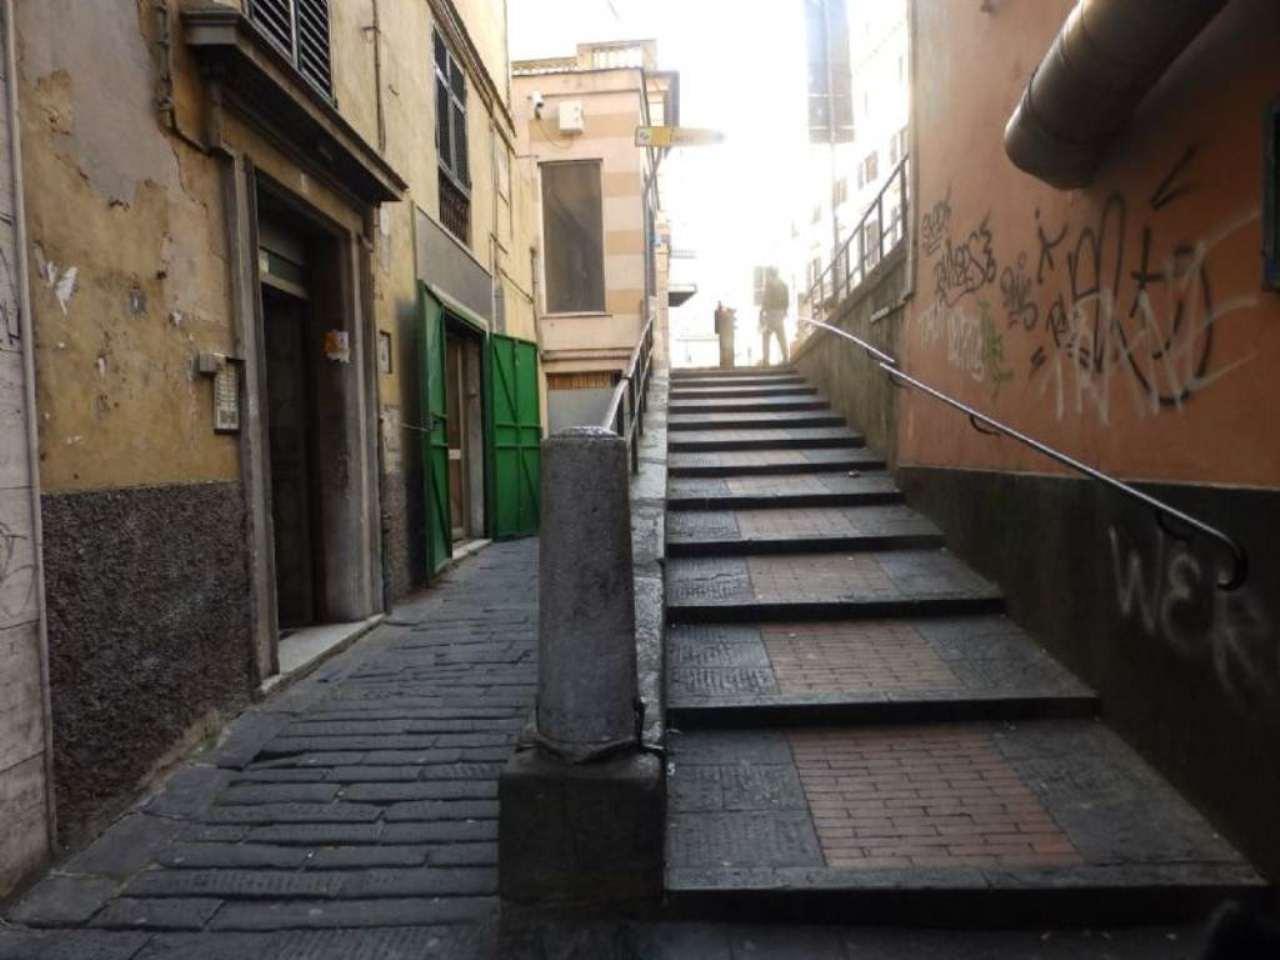 Bilocale Genova Salita San Paolo 6